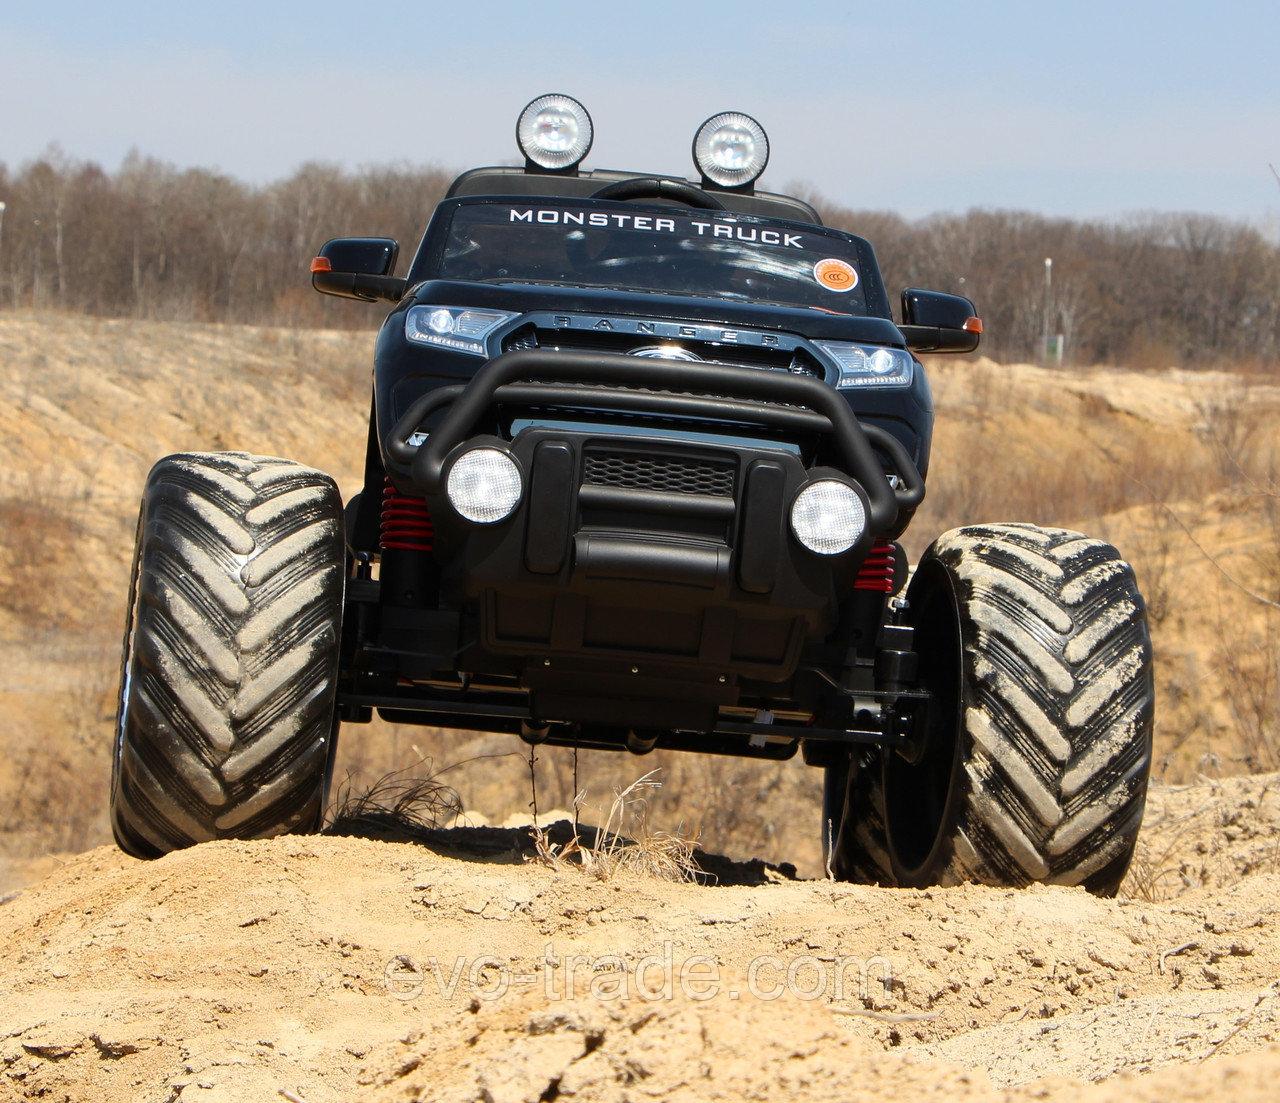 Электромобиль Ford Monster Truck 4x4 от Pinghu Dake